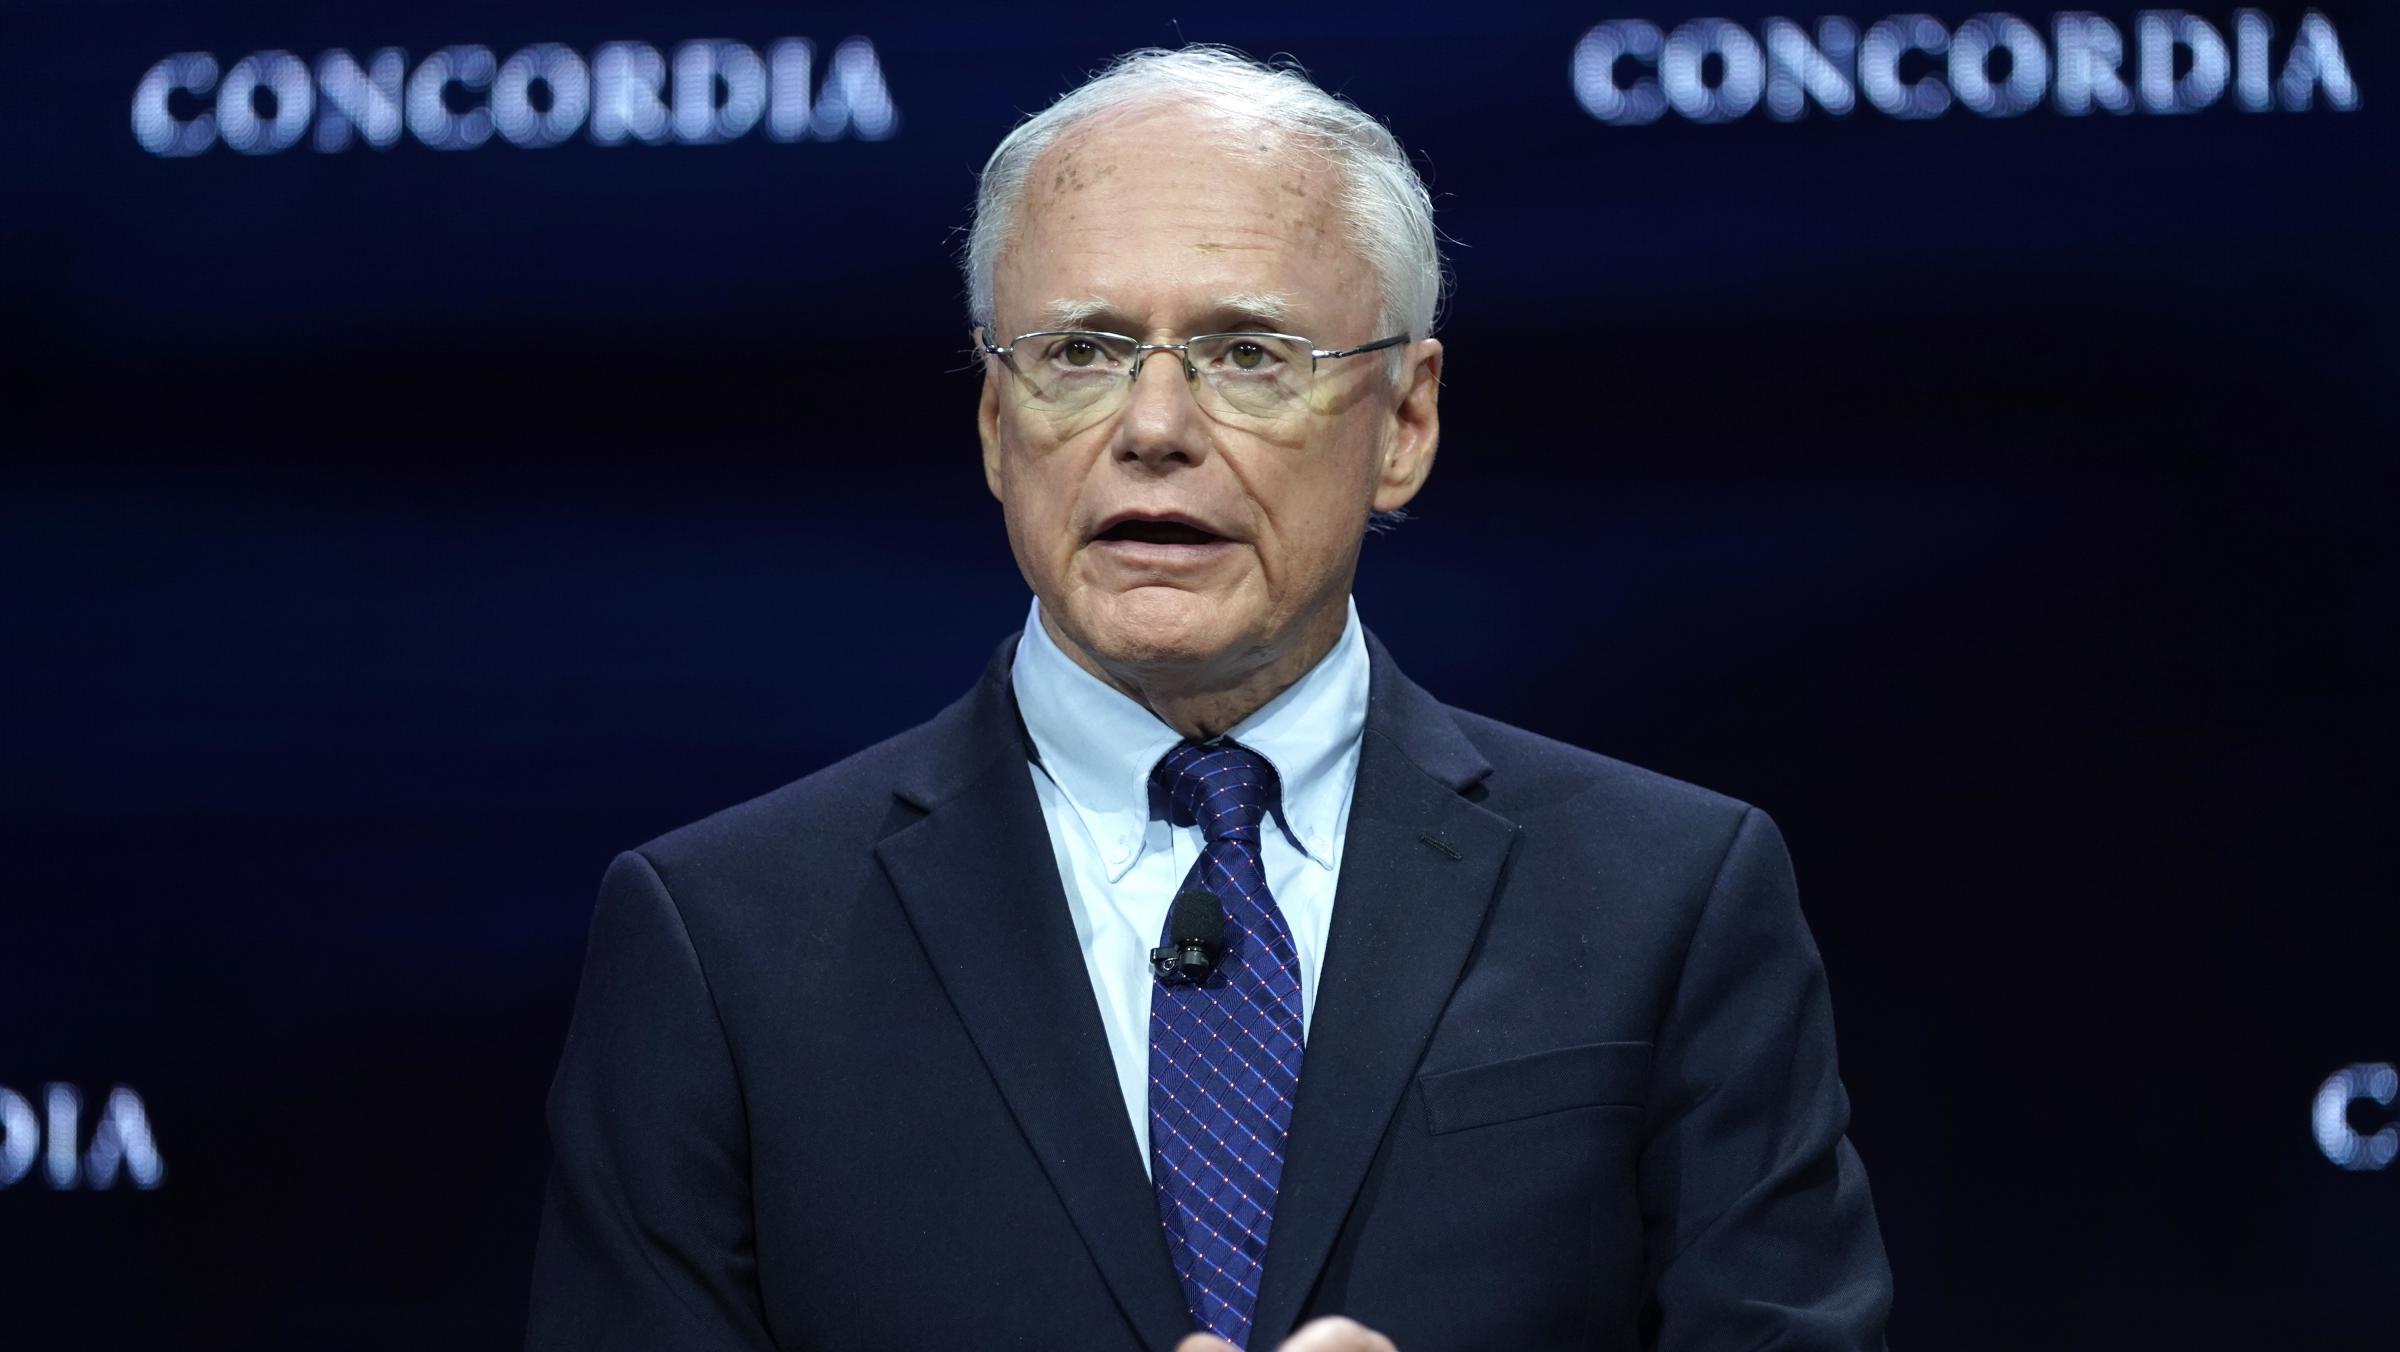 Syria Envoy To Face Bipartisan Grilling